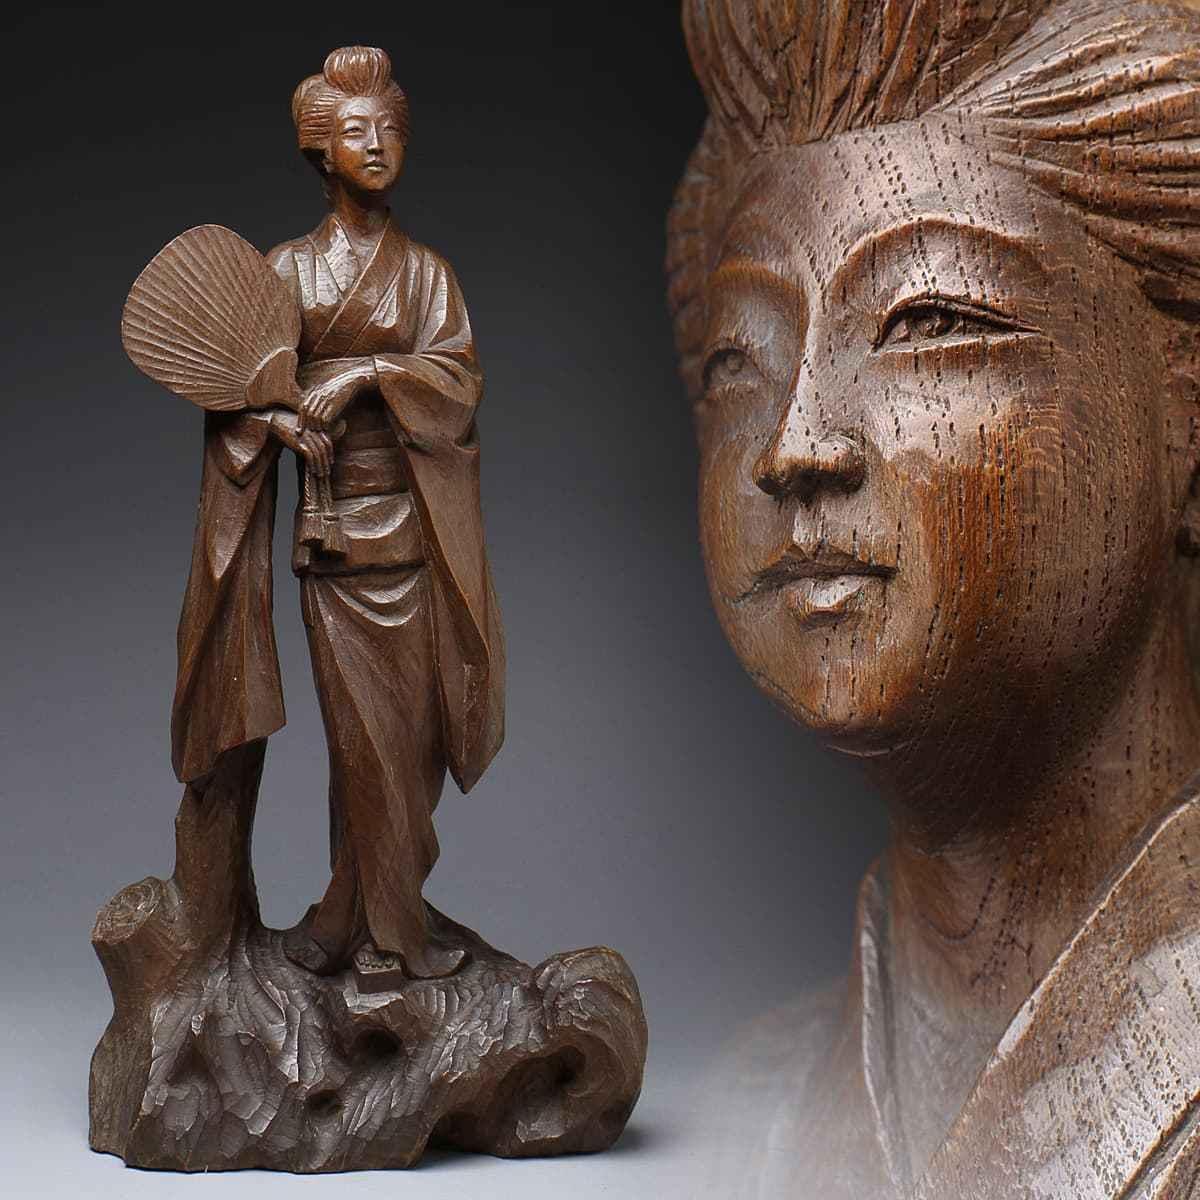 CW533 時代物 天然木 美杢 木彫美人像 高49.8cm 重2.9kg・木彫団扇美人・木雕仕女立像 床置飾/置物